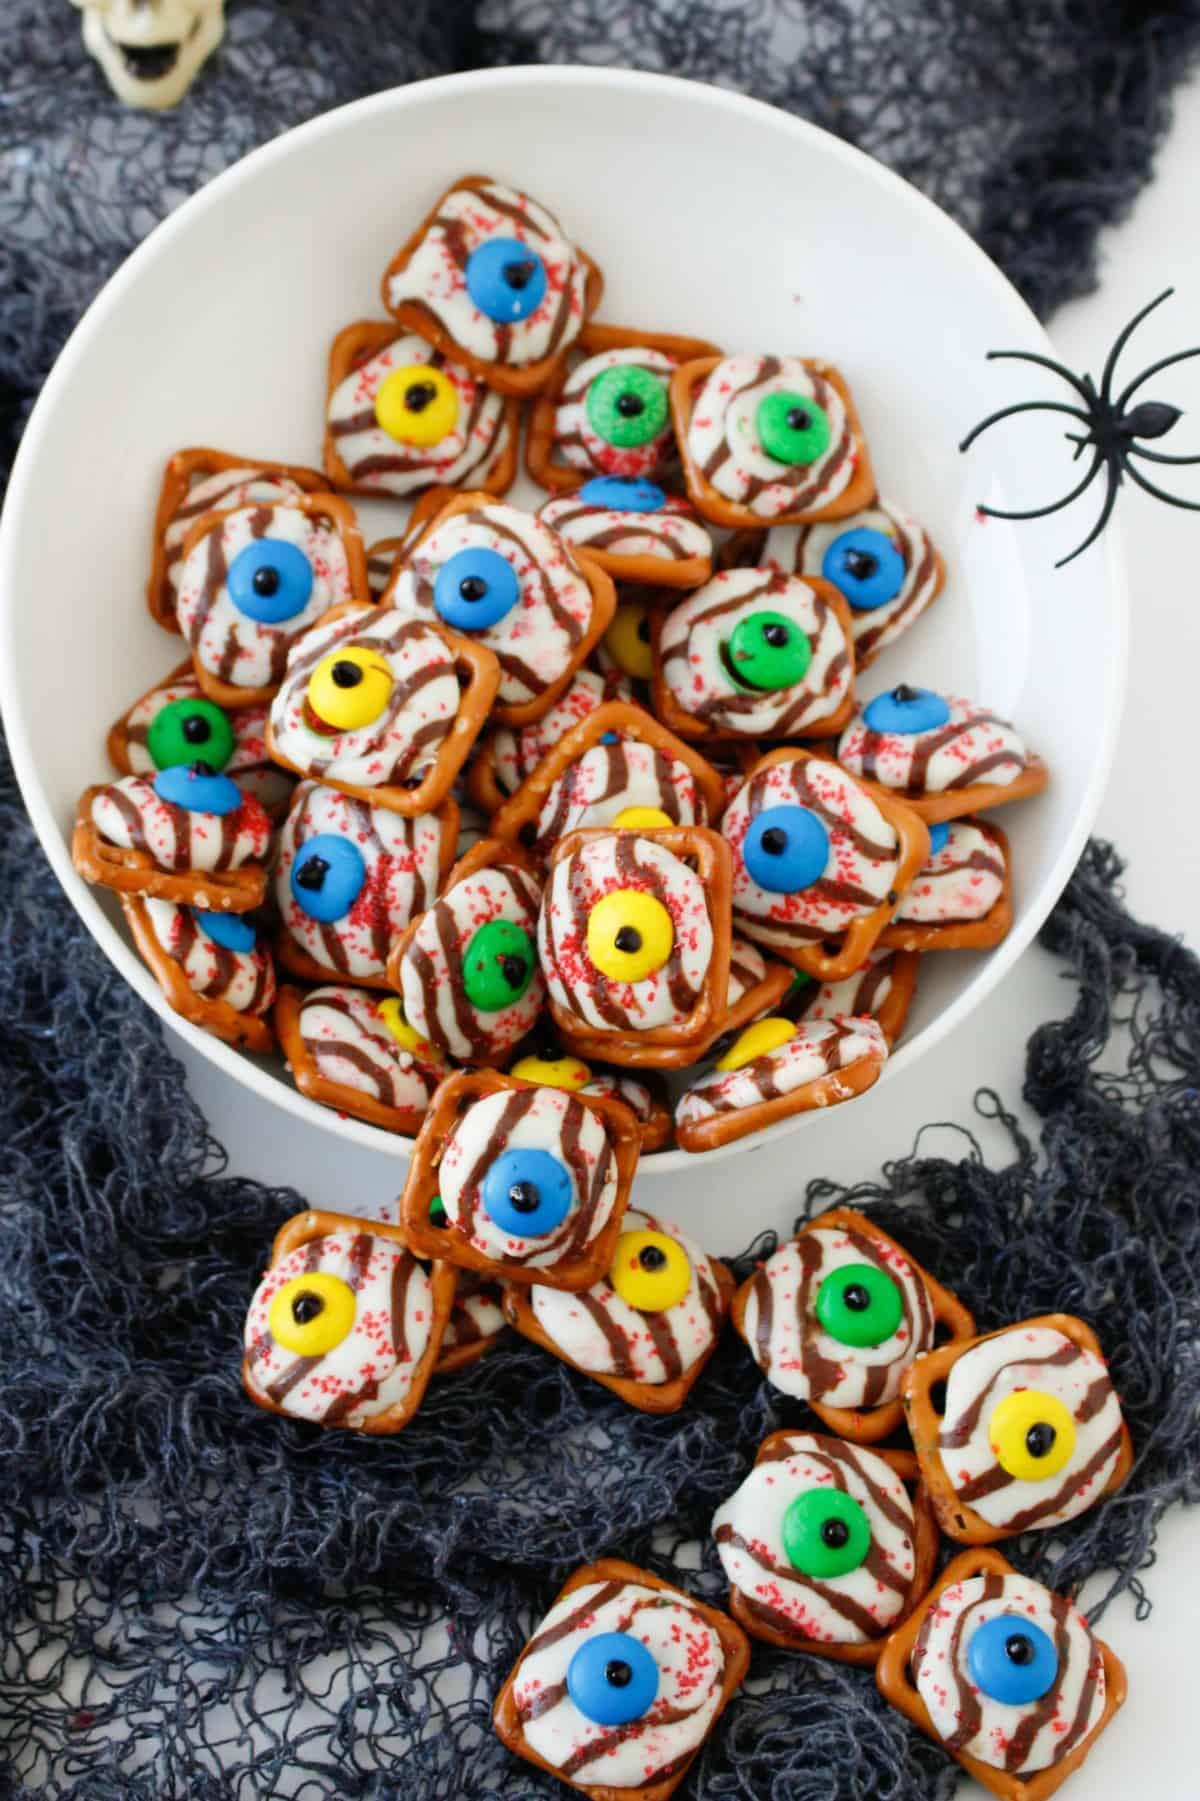 Halloween Pretzel Eyeballs in a white bowl with a spider